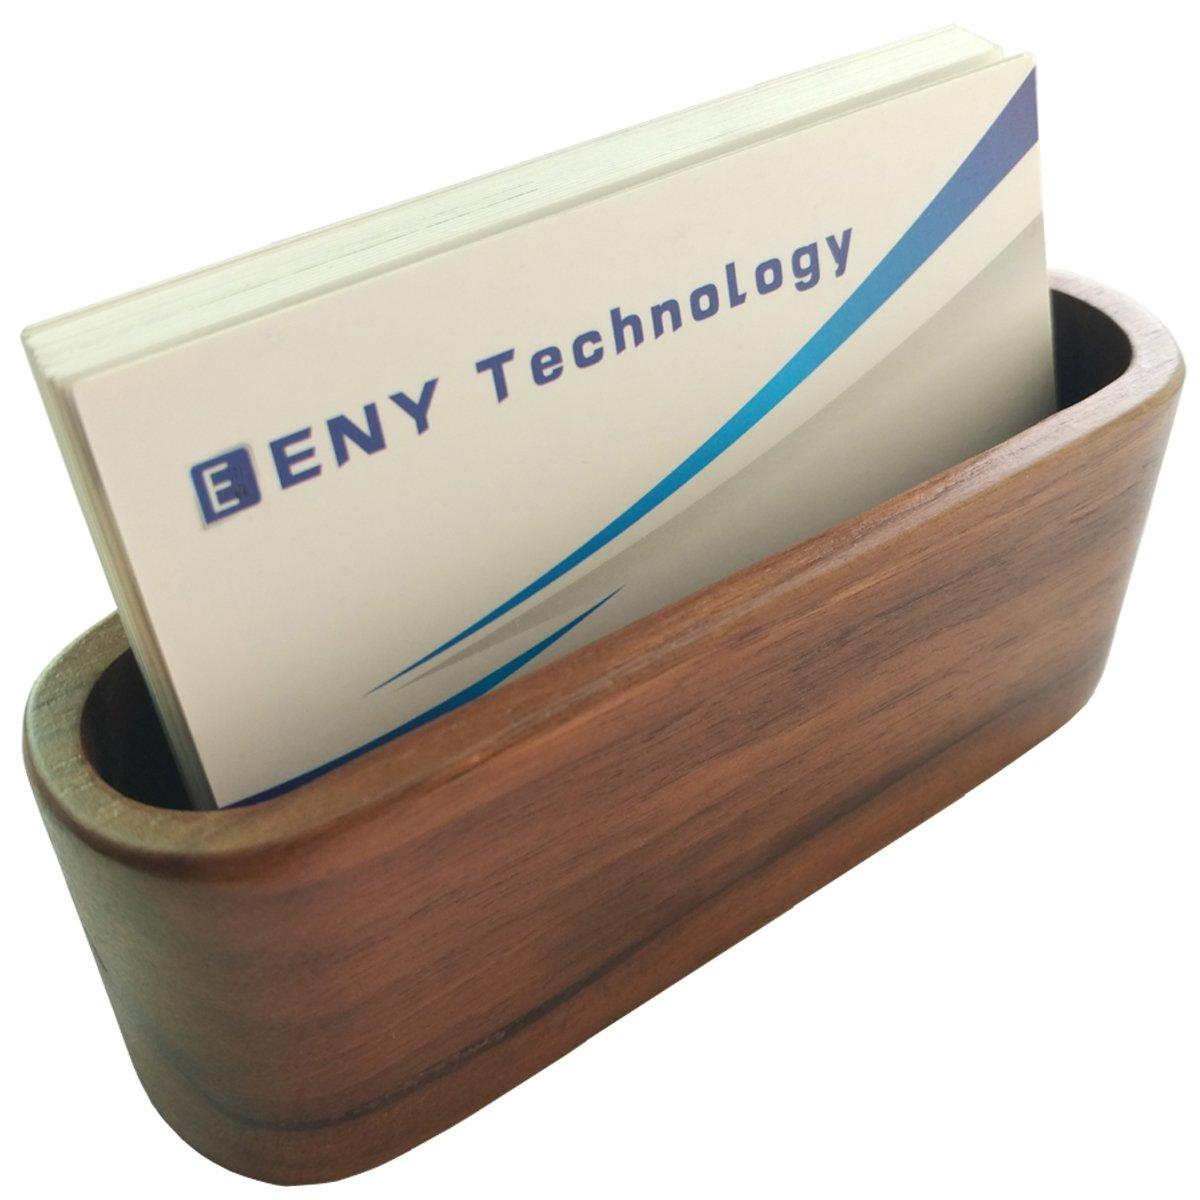 Business Card Holders | Amazon.com | Office & School Supplies - Desk ...